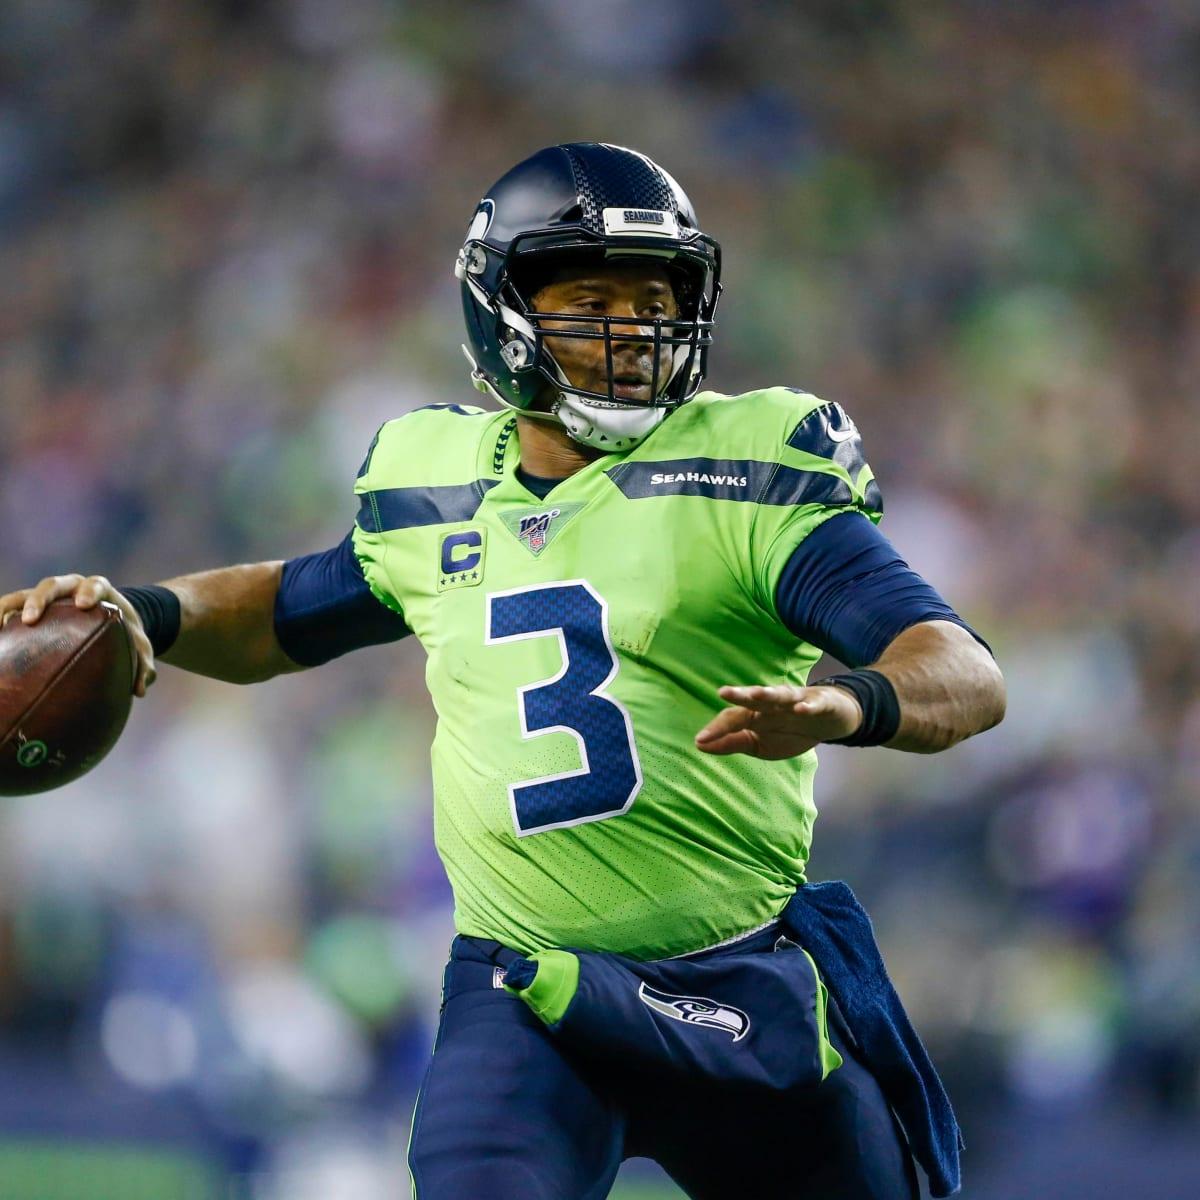 Will Seahawks Retro Uniforms Return in 2021?